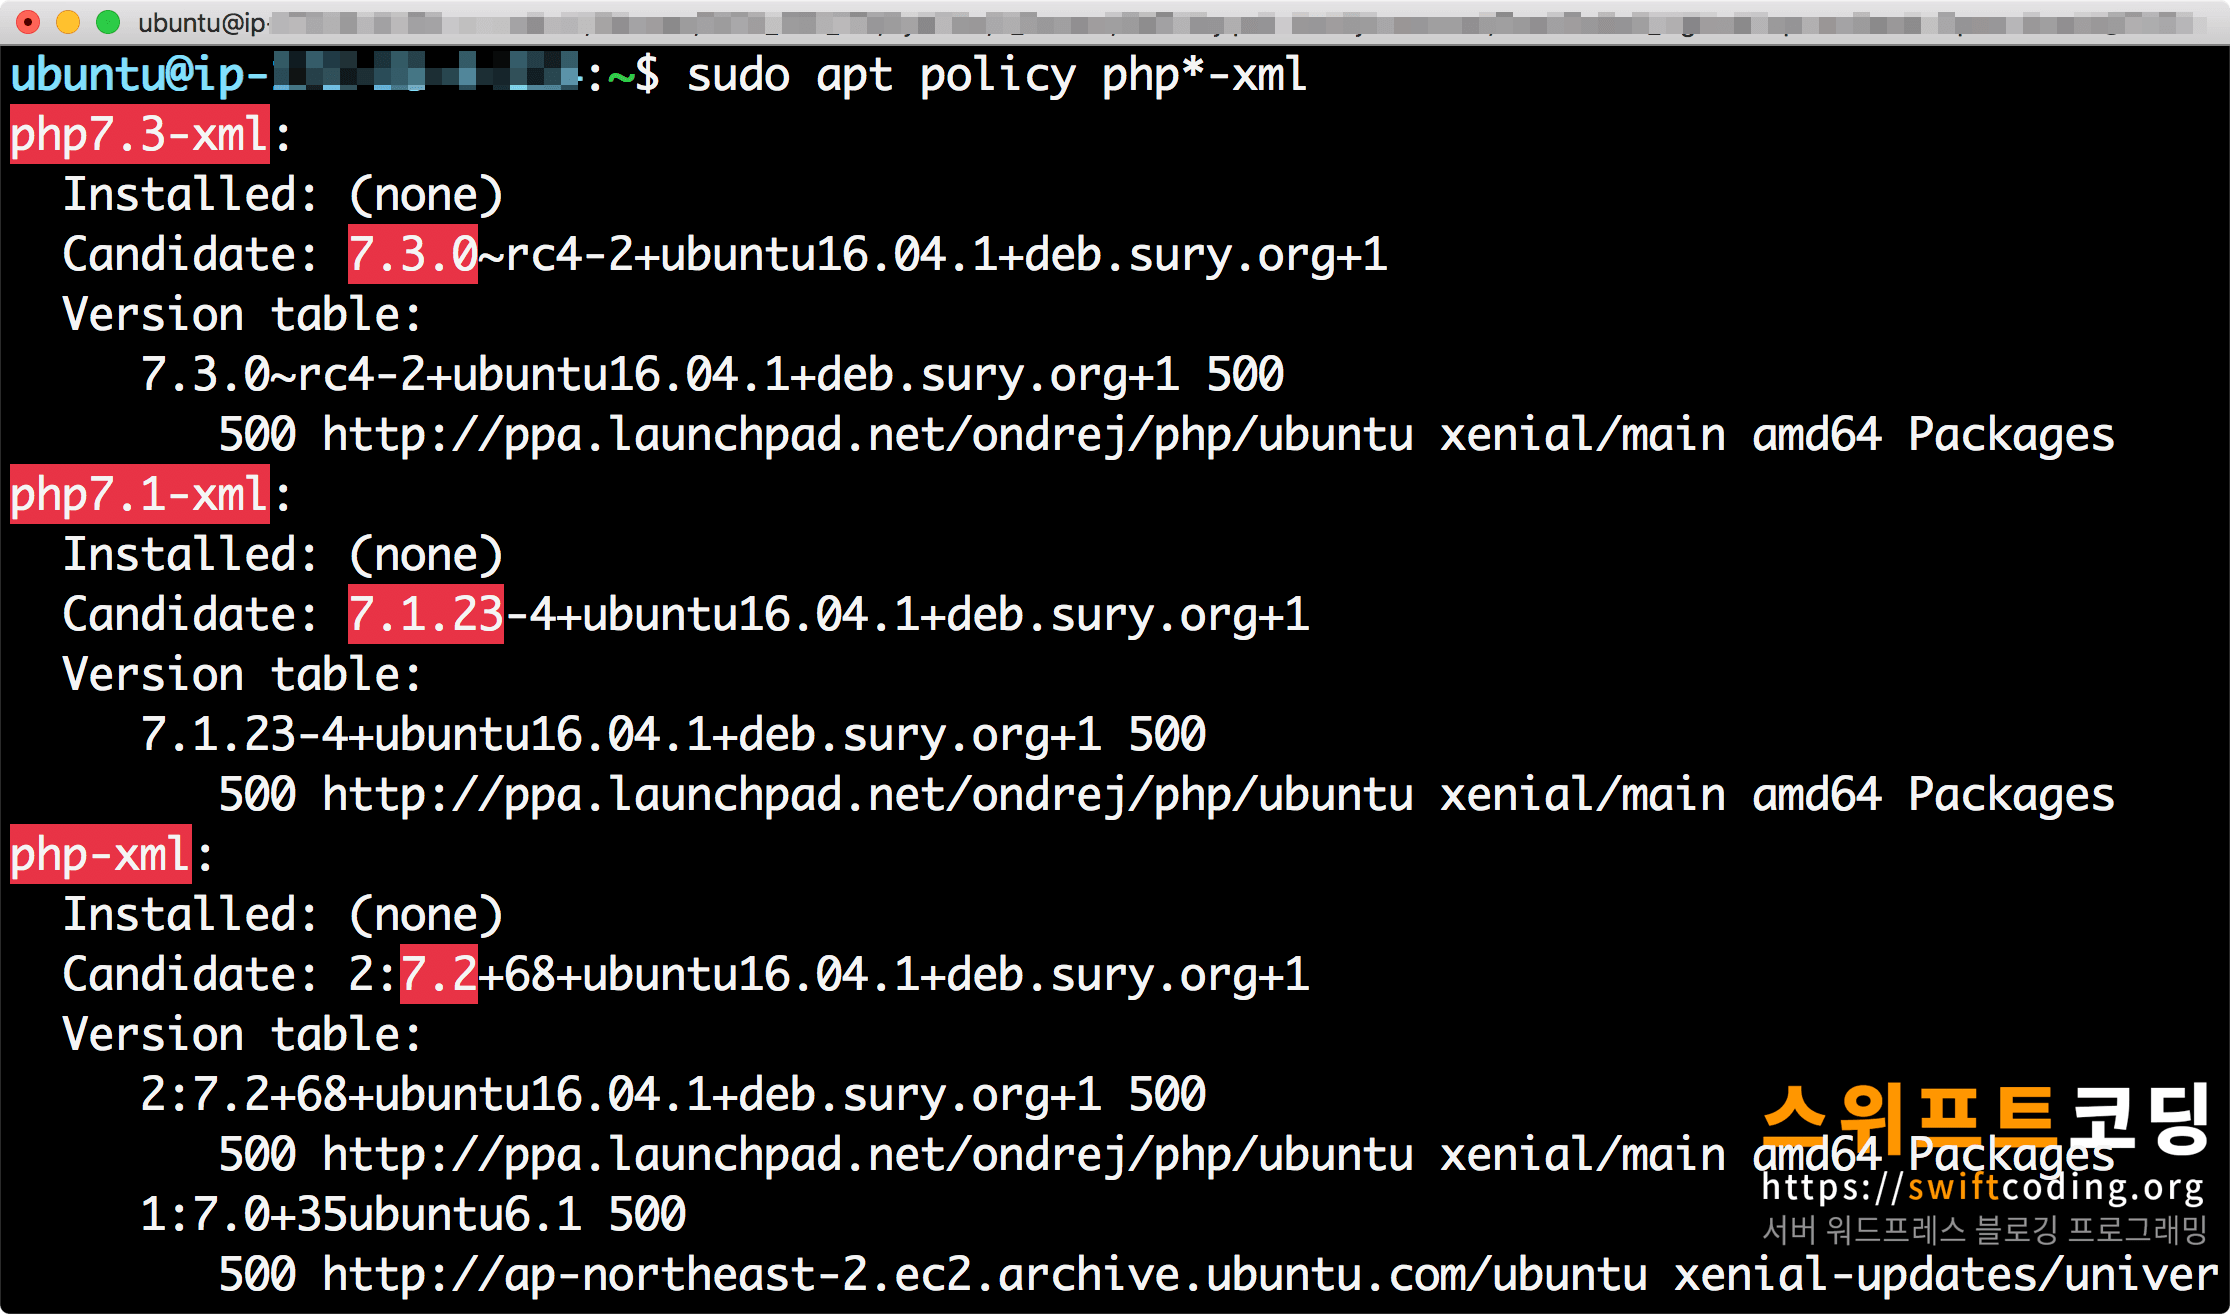 php-xml, php7.2-xml, php7.3-xml